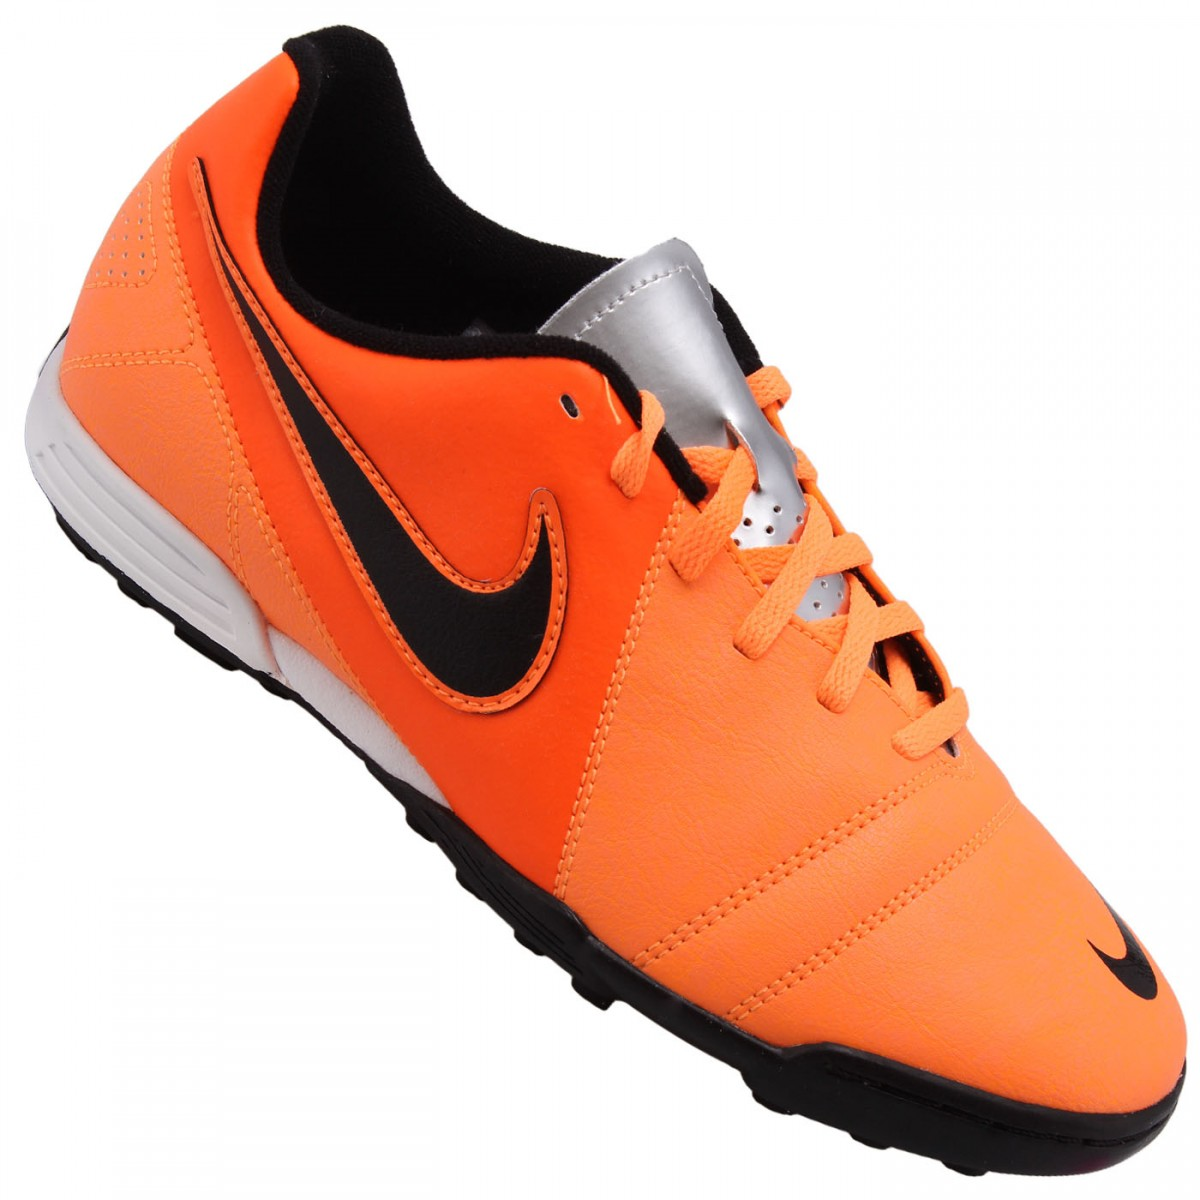 ba0746eb32 Chuteira Nike CTR360 Enganche III TF